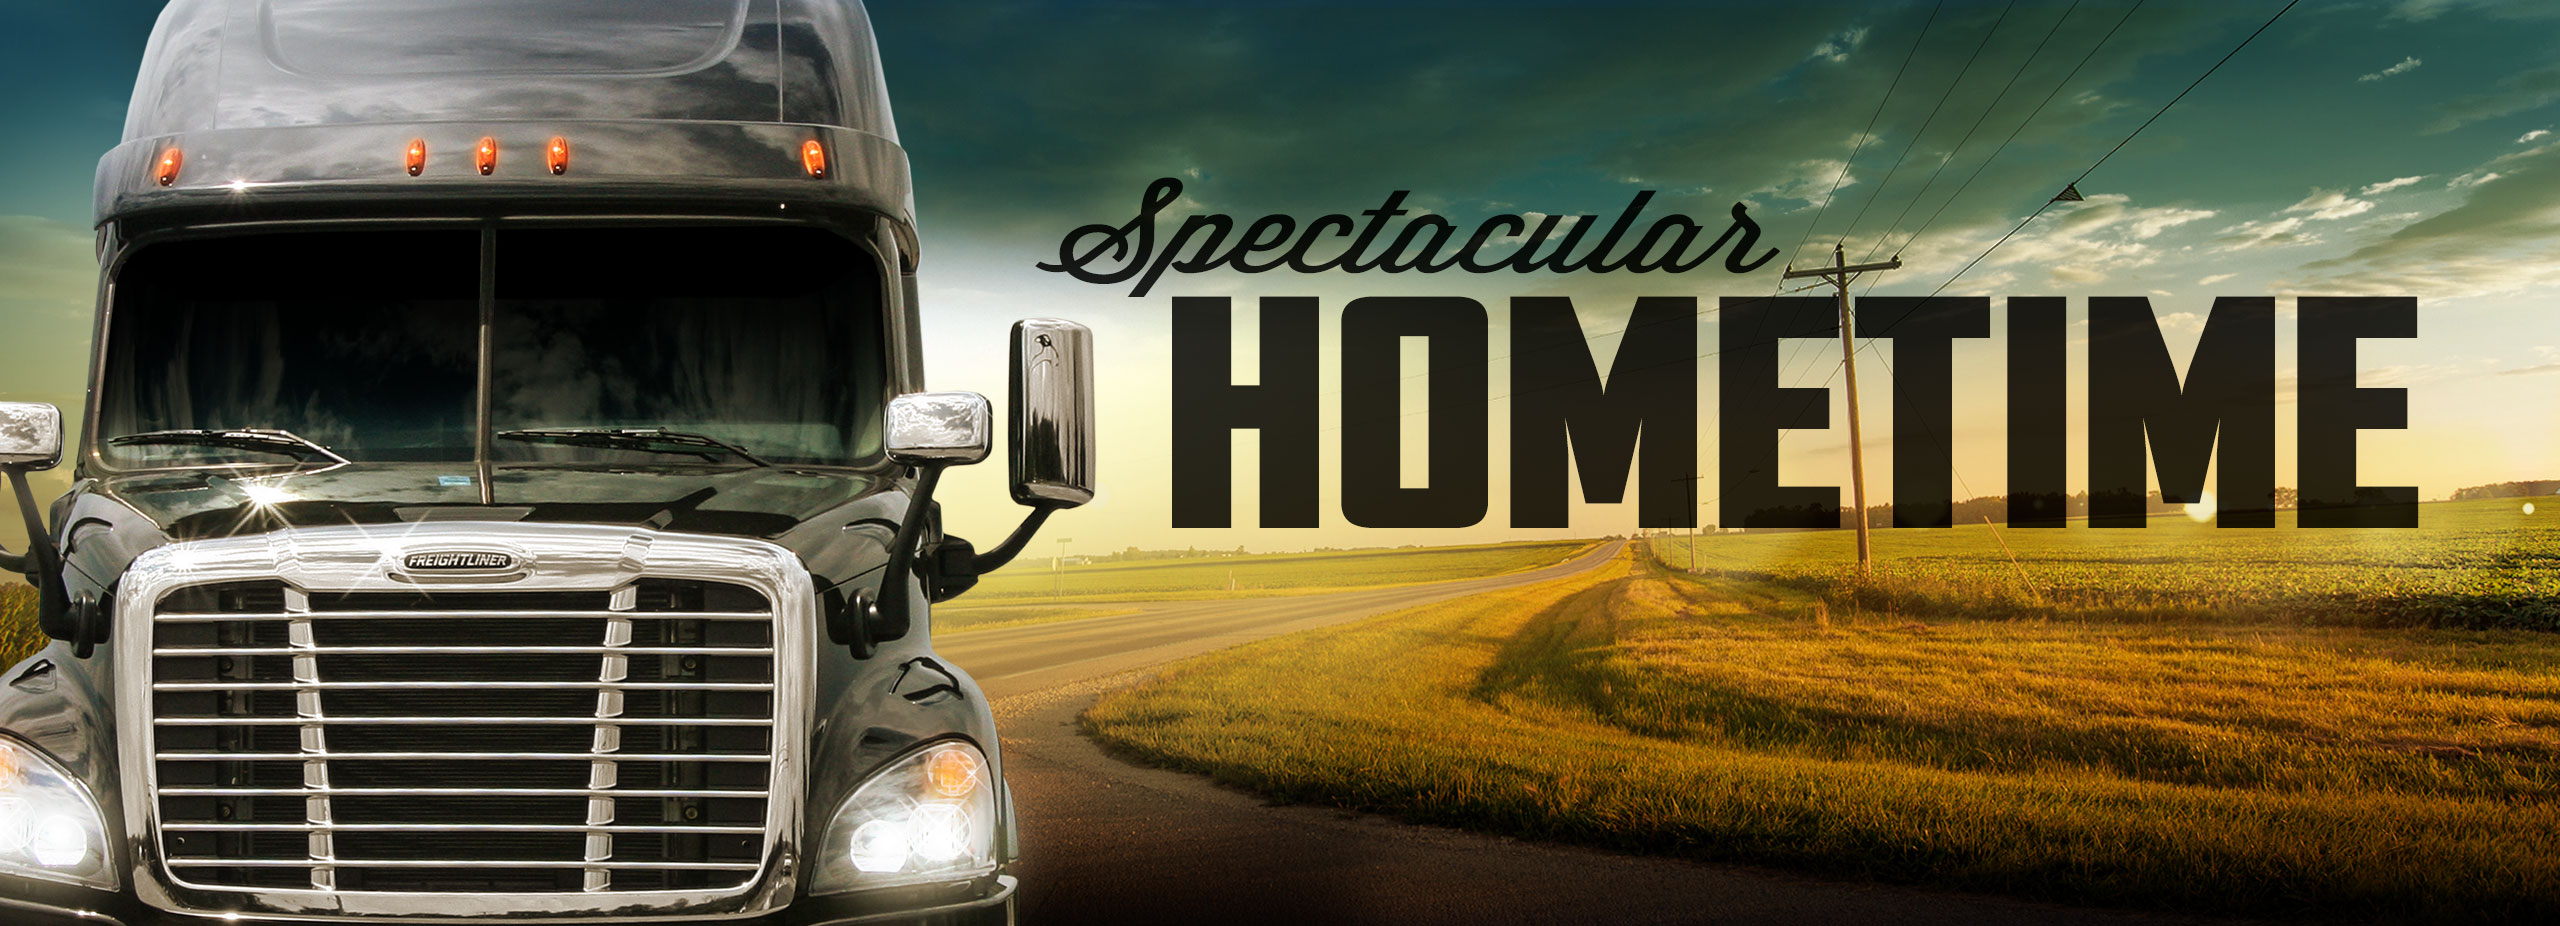 Spectacular Hometime